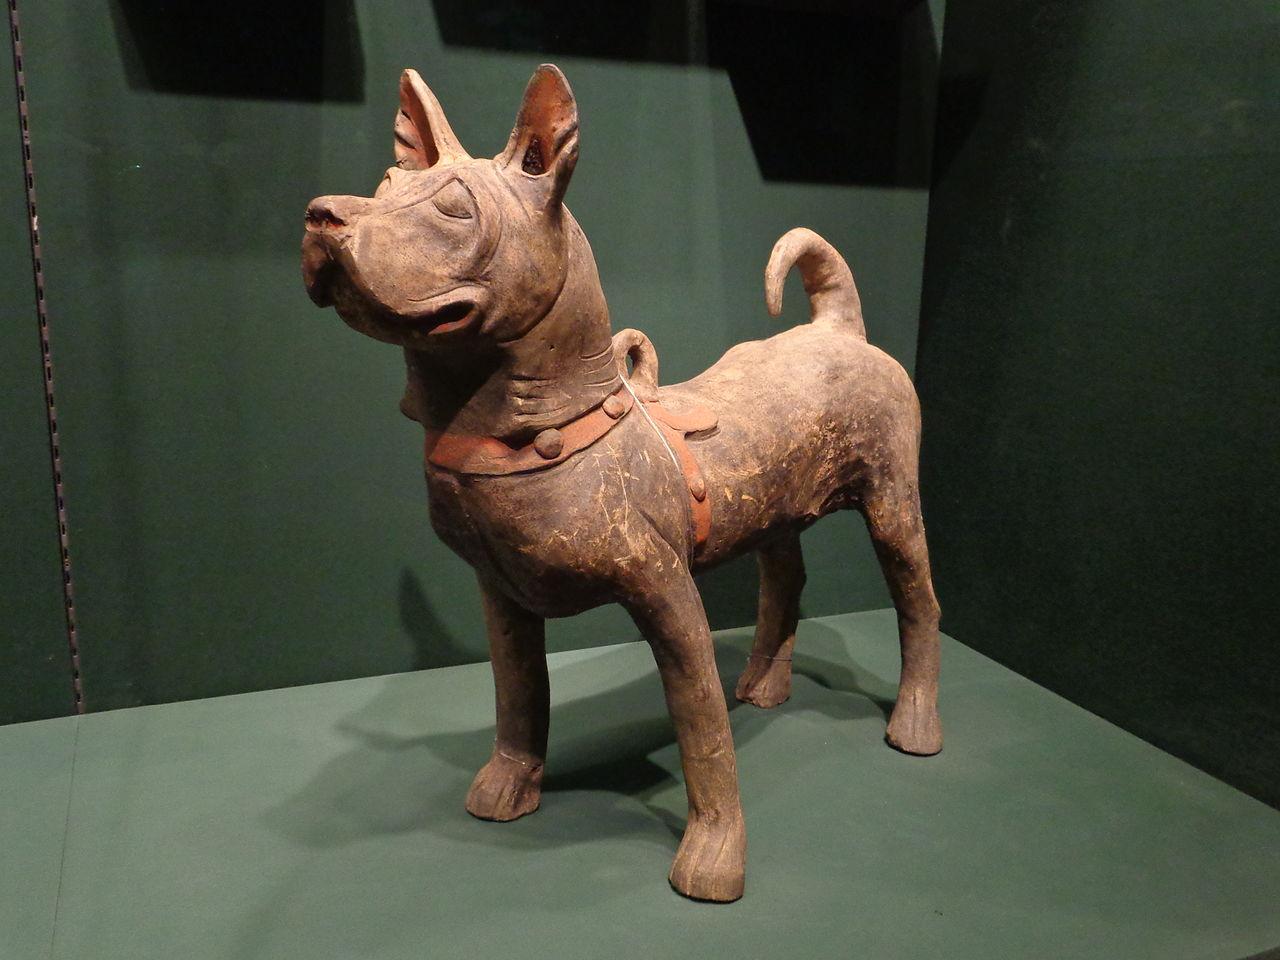 1280px-Escultura_perro_China_Han.JPG